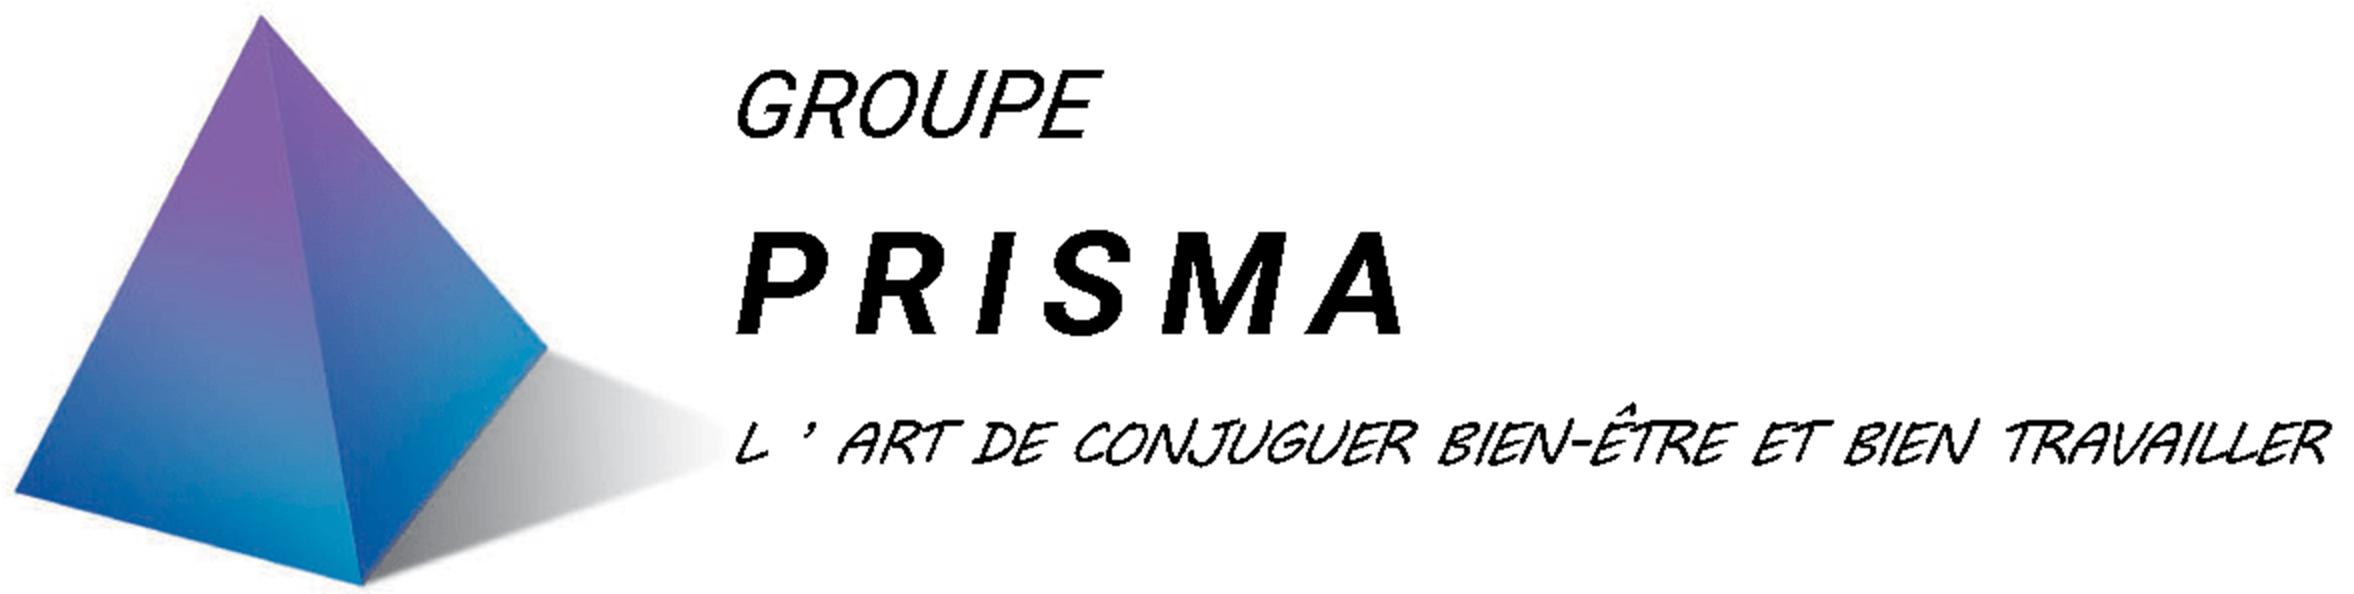 groupe prisma2